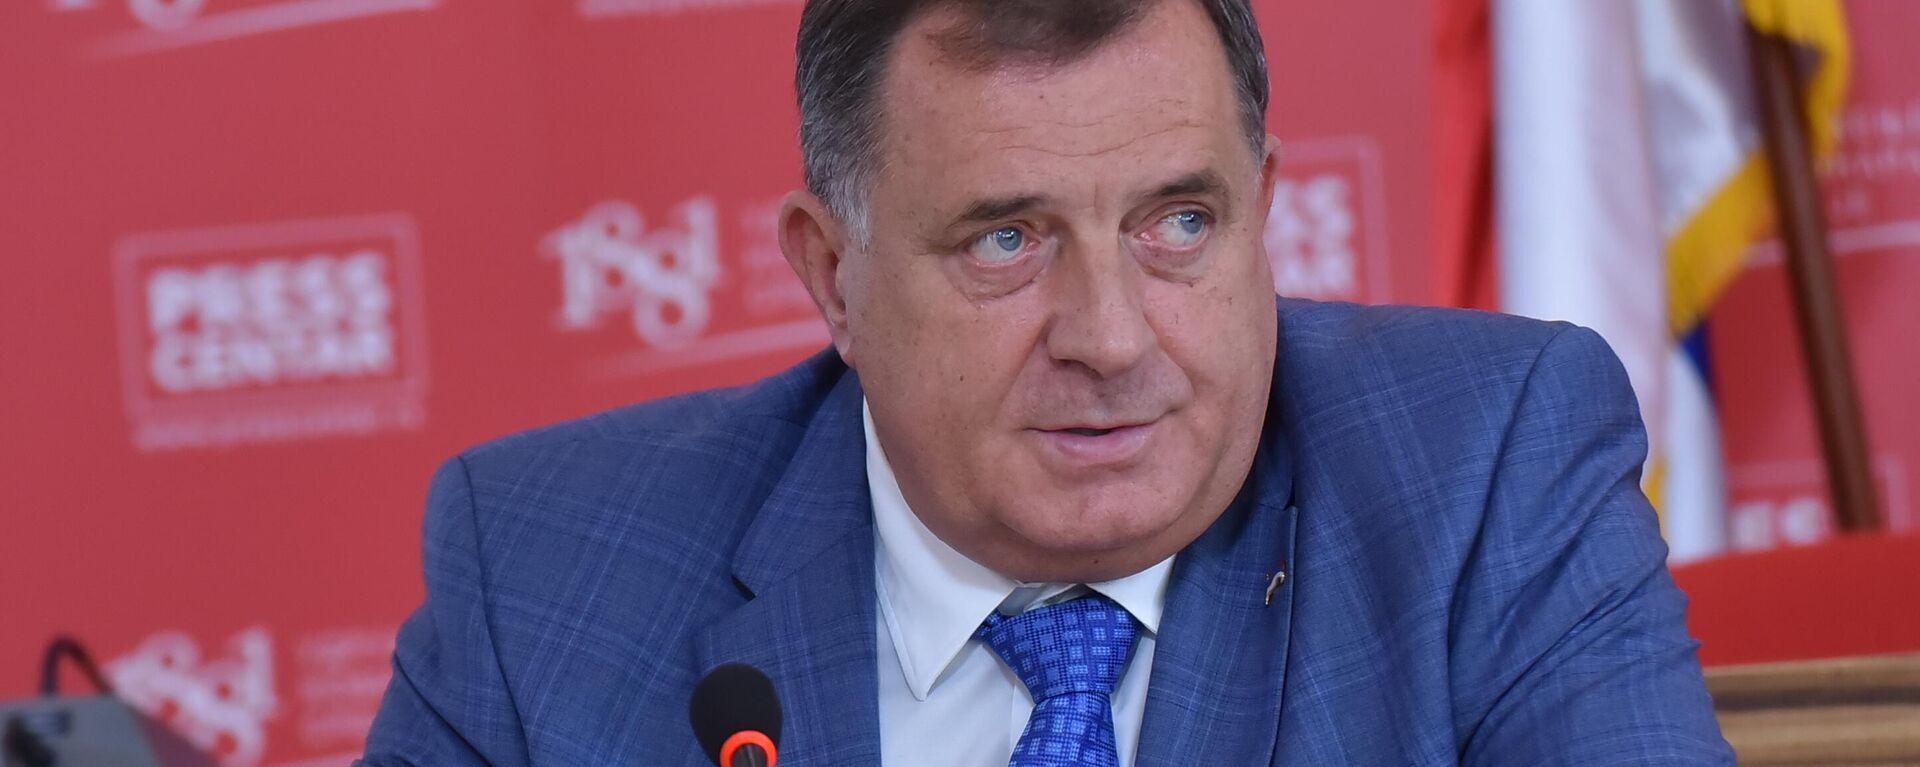 Milorad Dodik - Sputnik Srbija, 1920, 18.09.2021